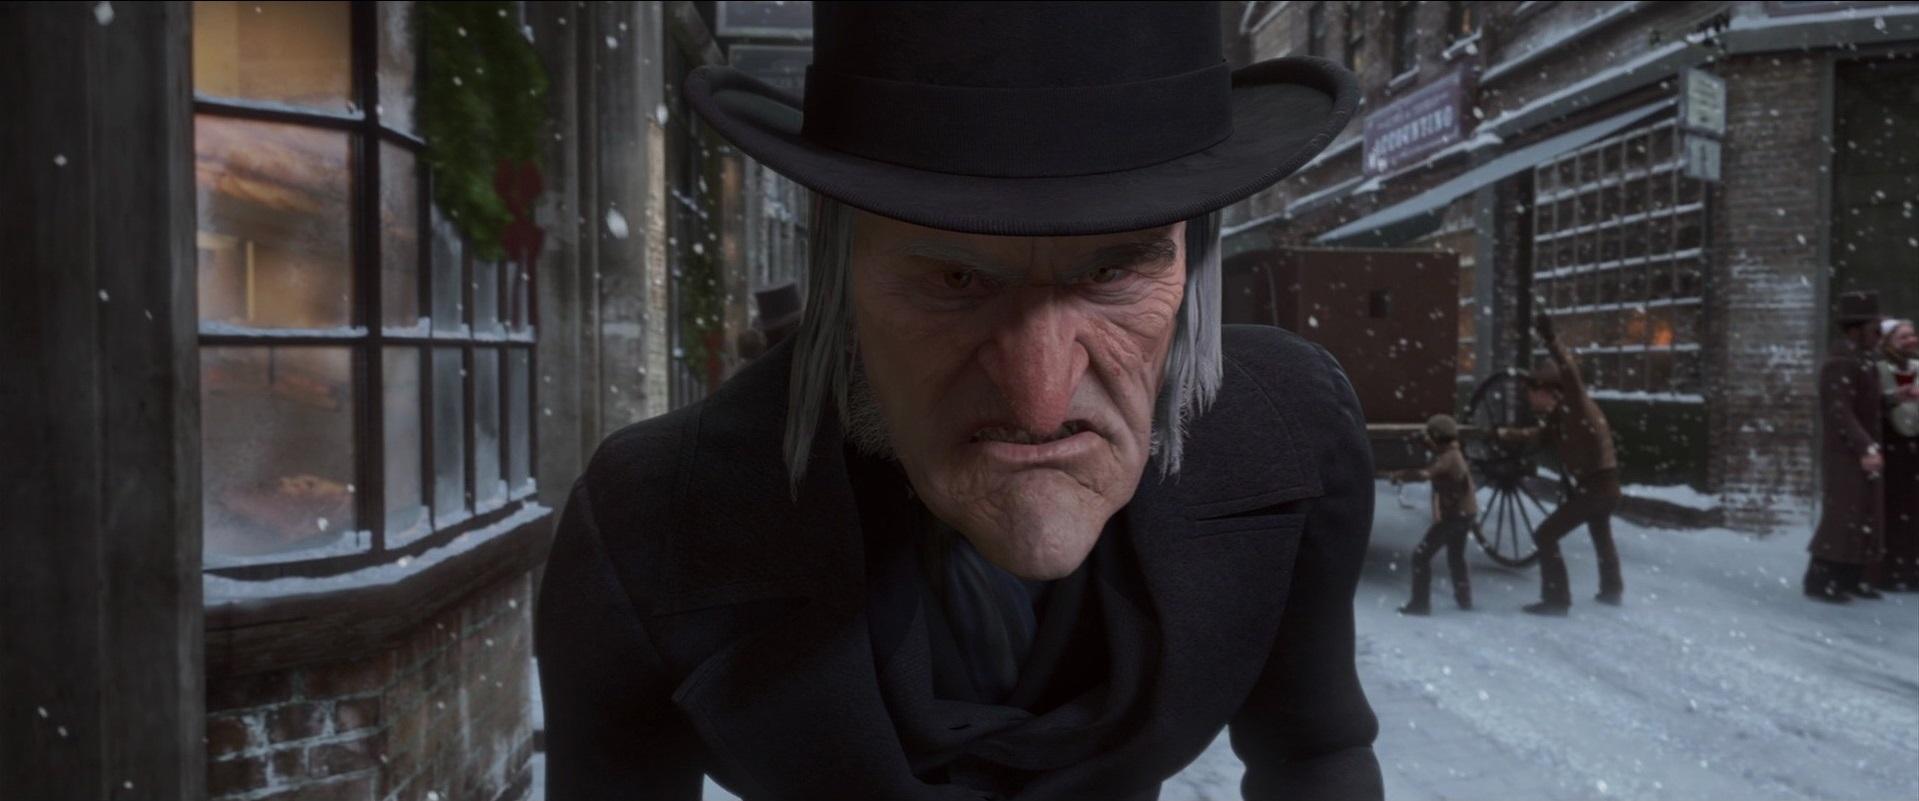 Ebenezer Scrooge from A Christmas Carolv(Source: Disney Wiki)